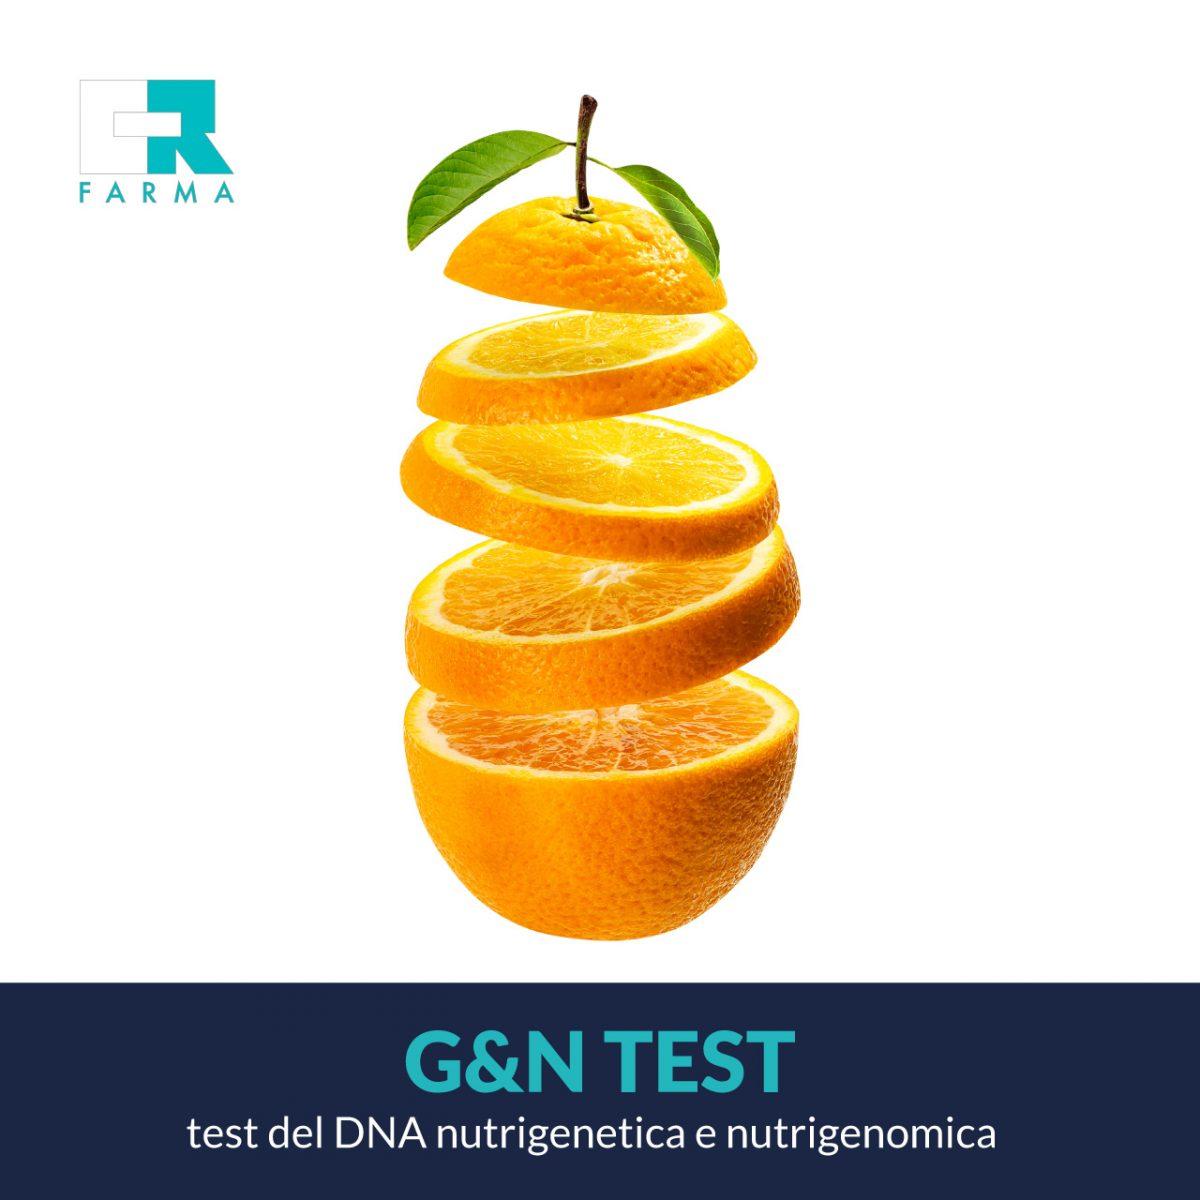 G&N test - Analisi del DNA nutrigenetica e nutrigenomica